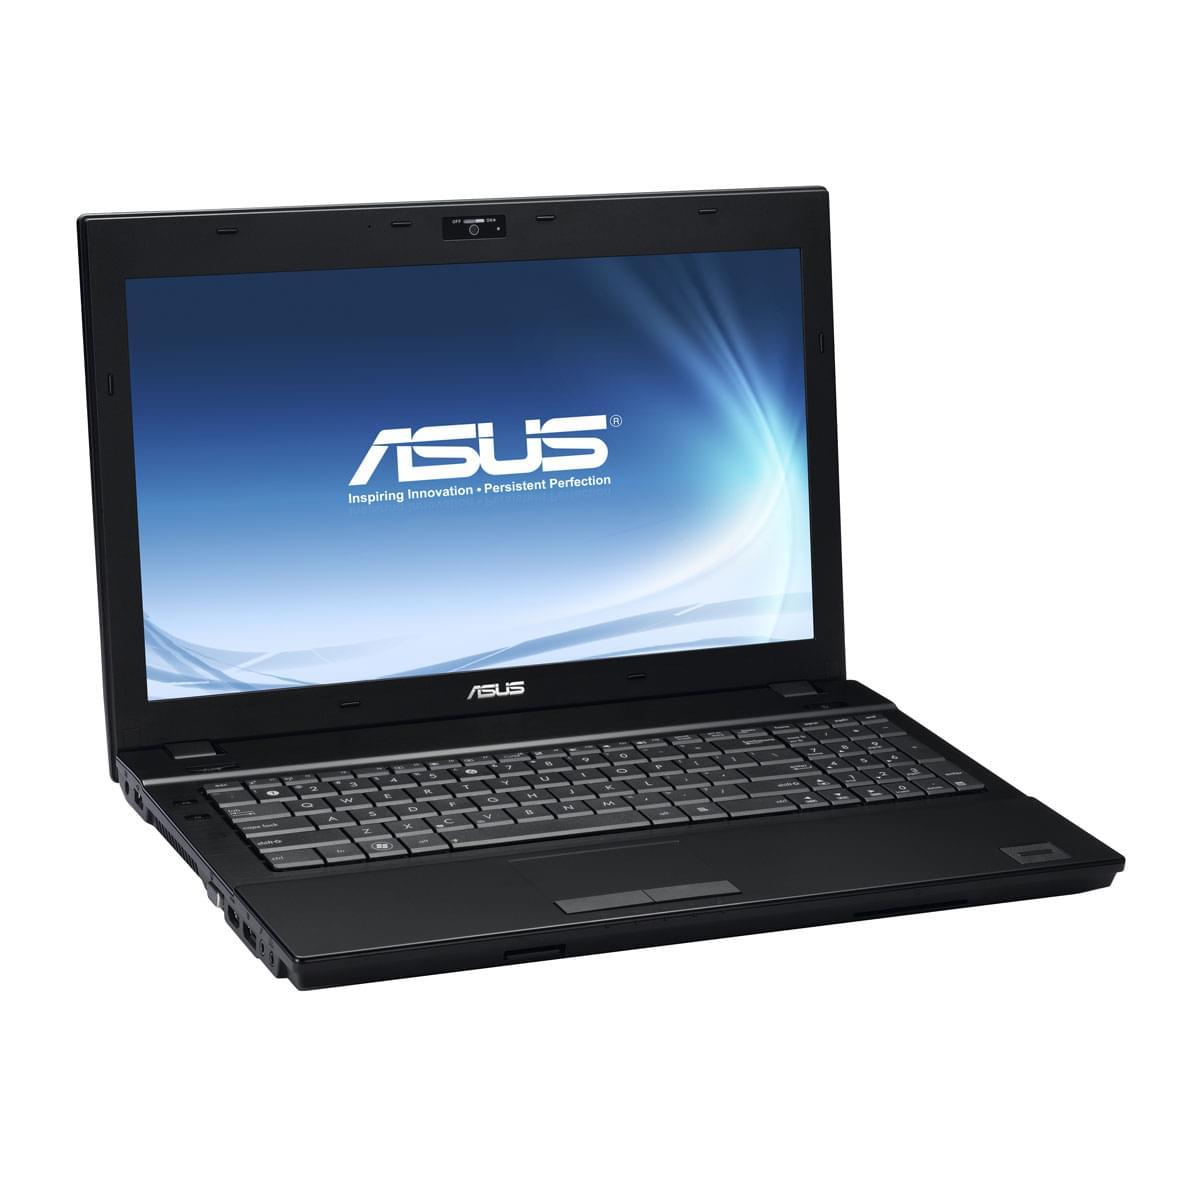 Asus B53V-S4050G (B53V-S4050G) - Achat / Vente PC portable sur Cybertek.fr - 0